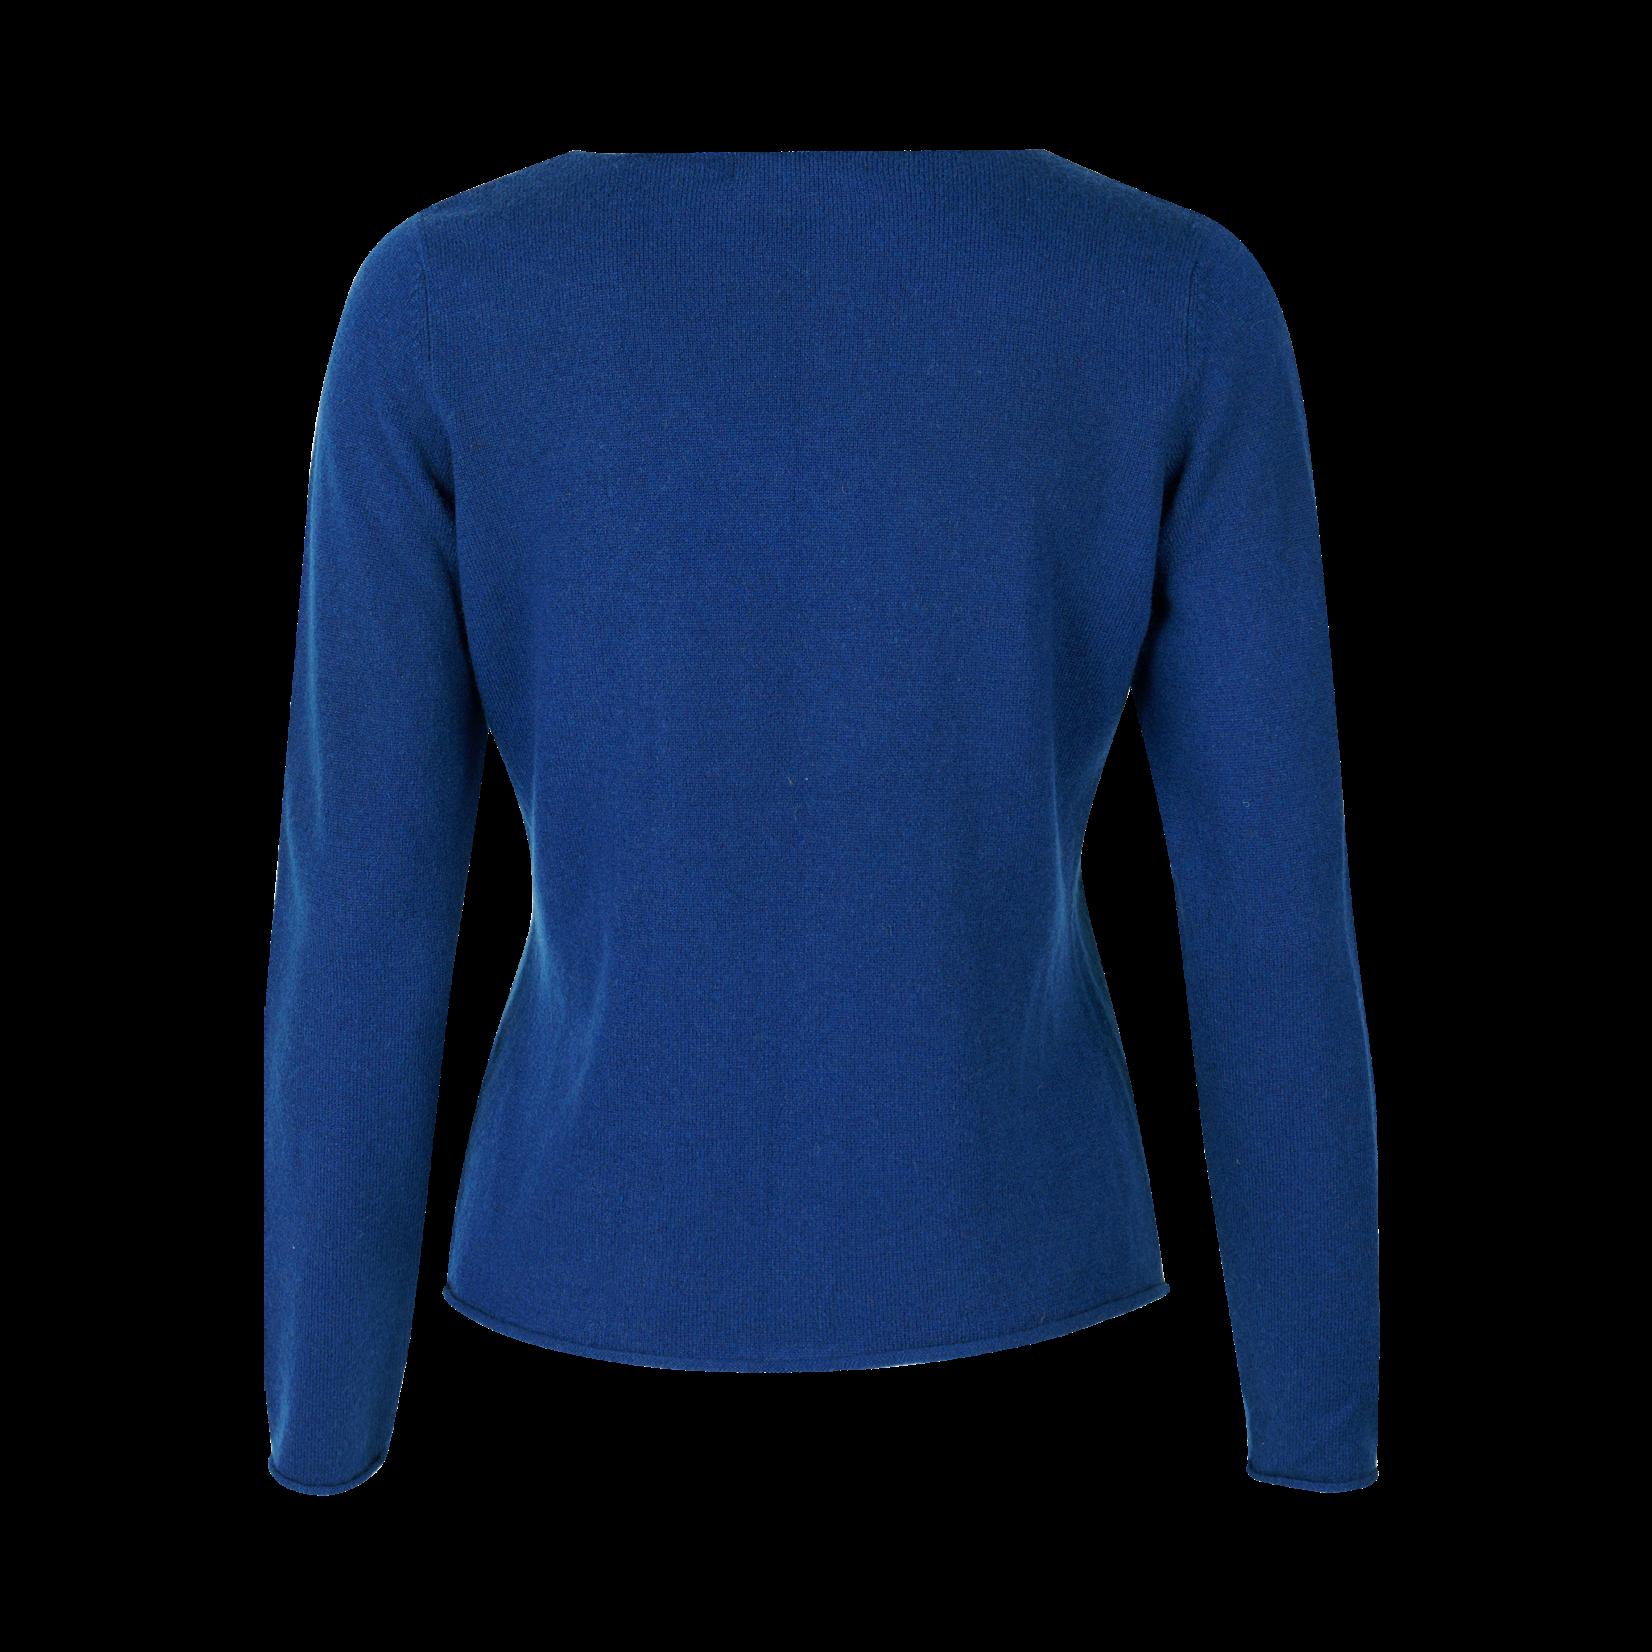 Odno - Pullover aus Kaschmir - himmelblau